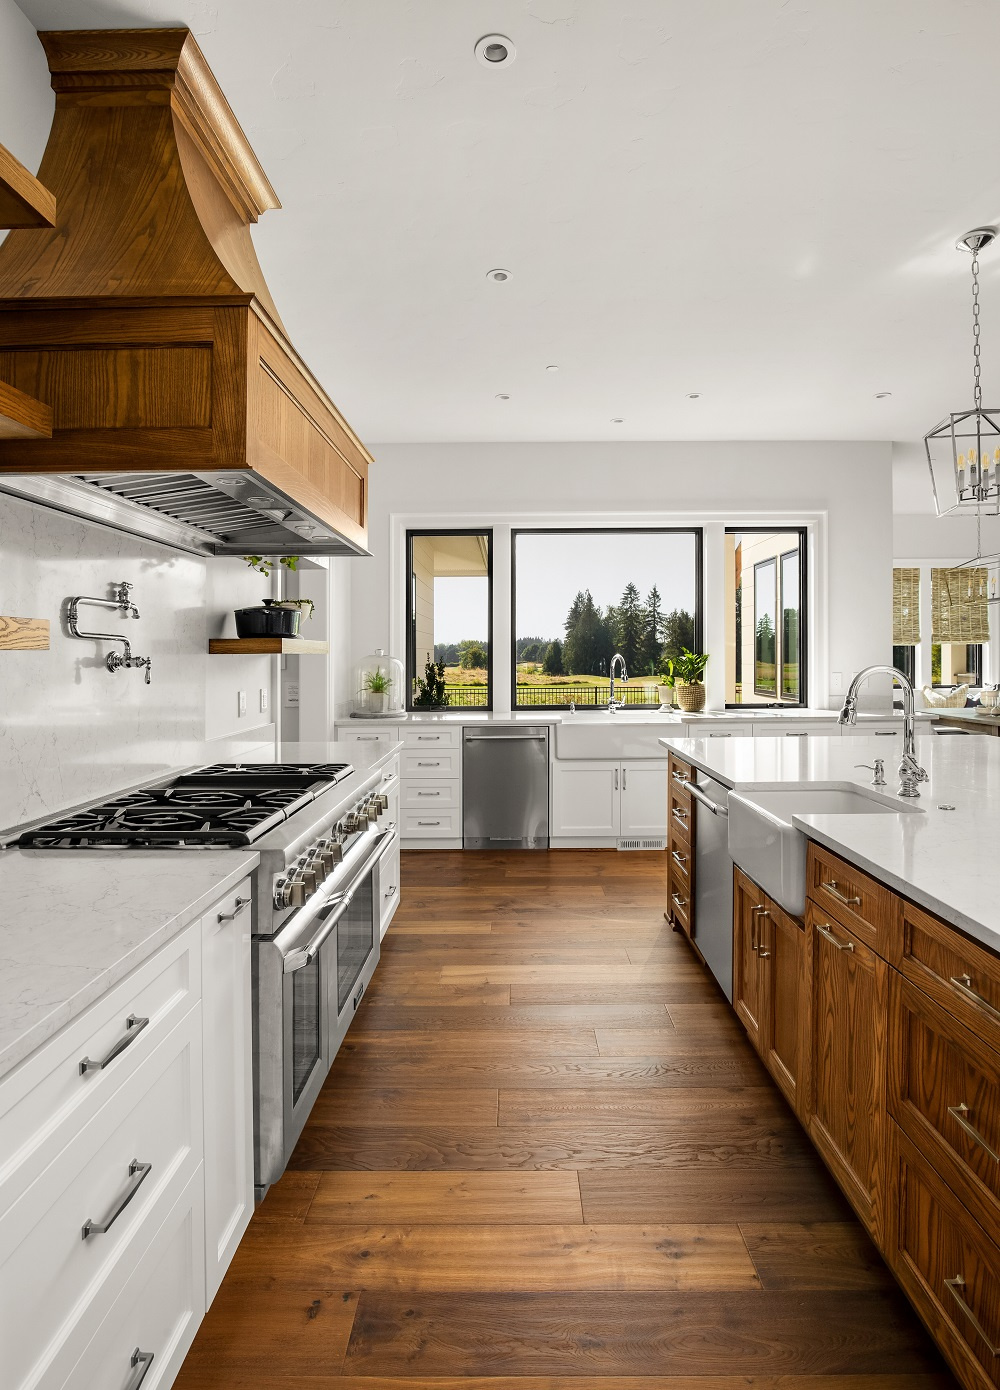 Dark Brown Wide-Plank Hardwood Floor in Kitchen